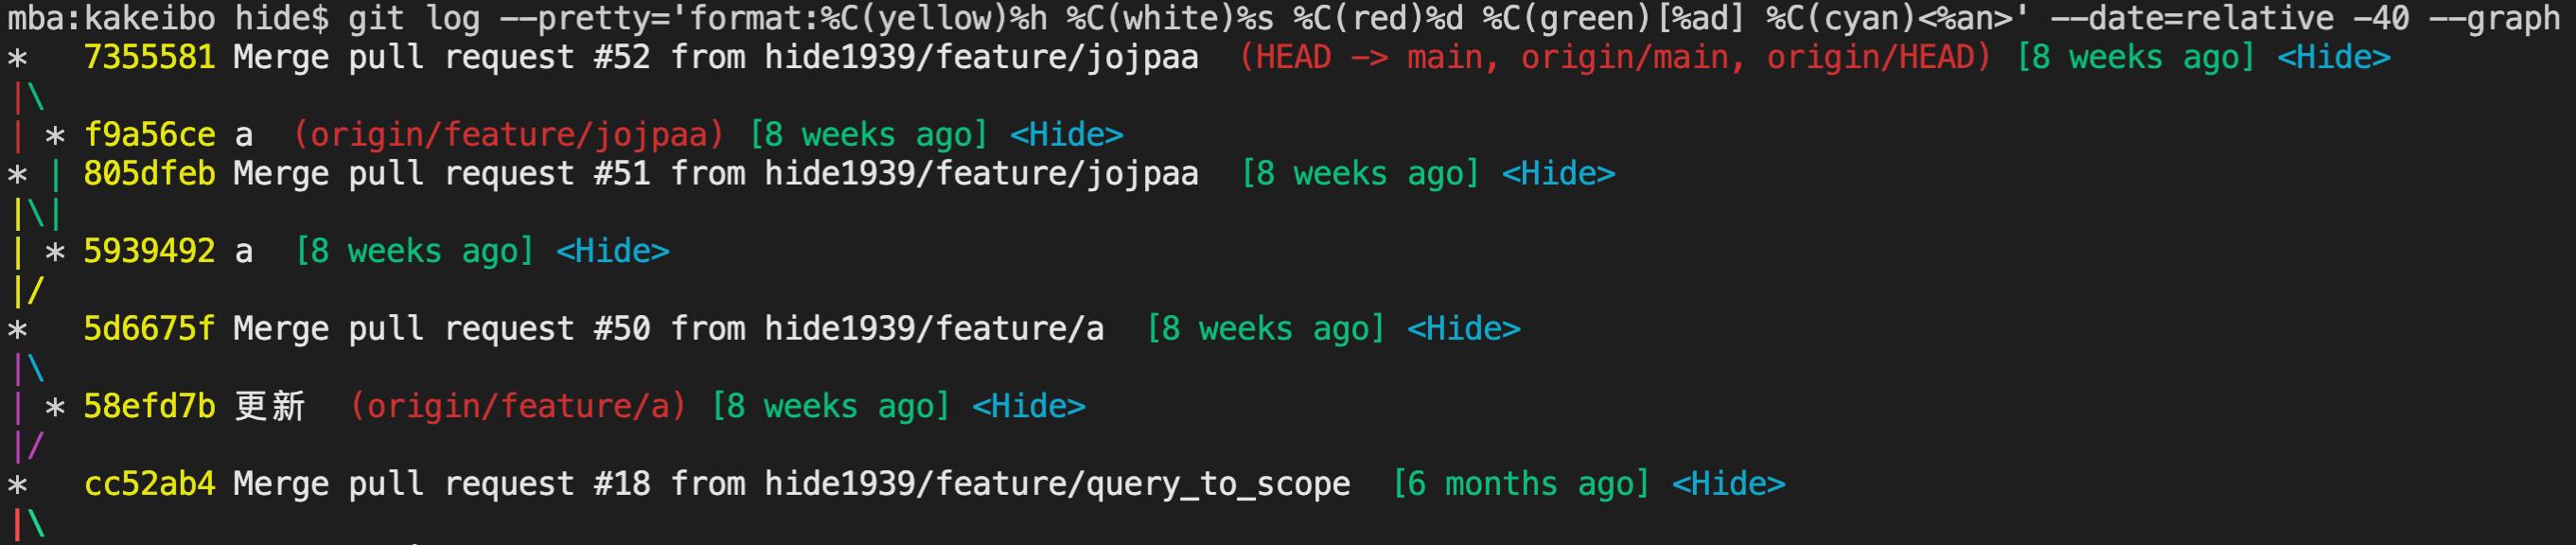 git logにカスタマイズオプションを指定した場合の実行結果